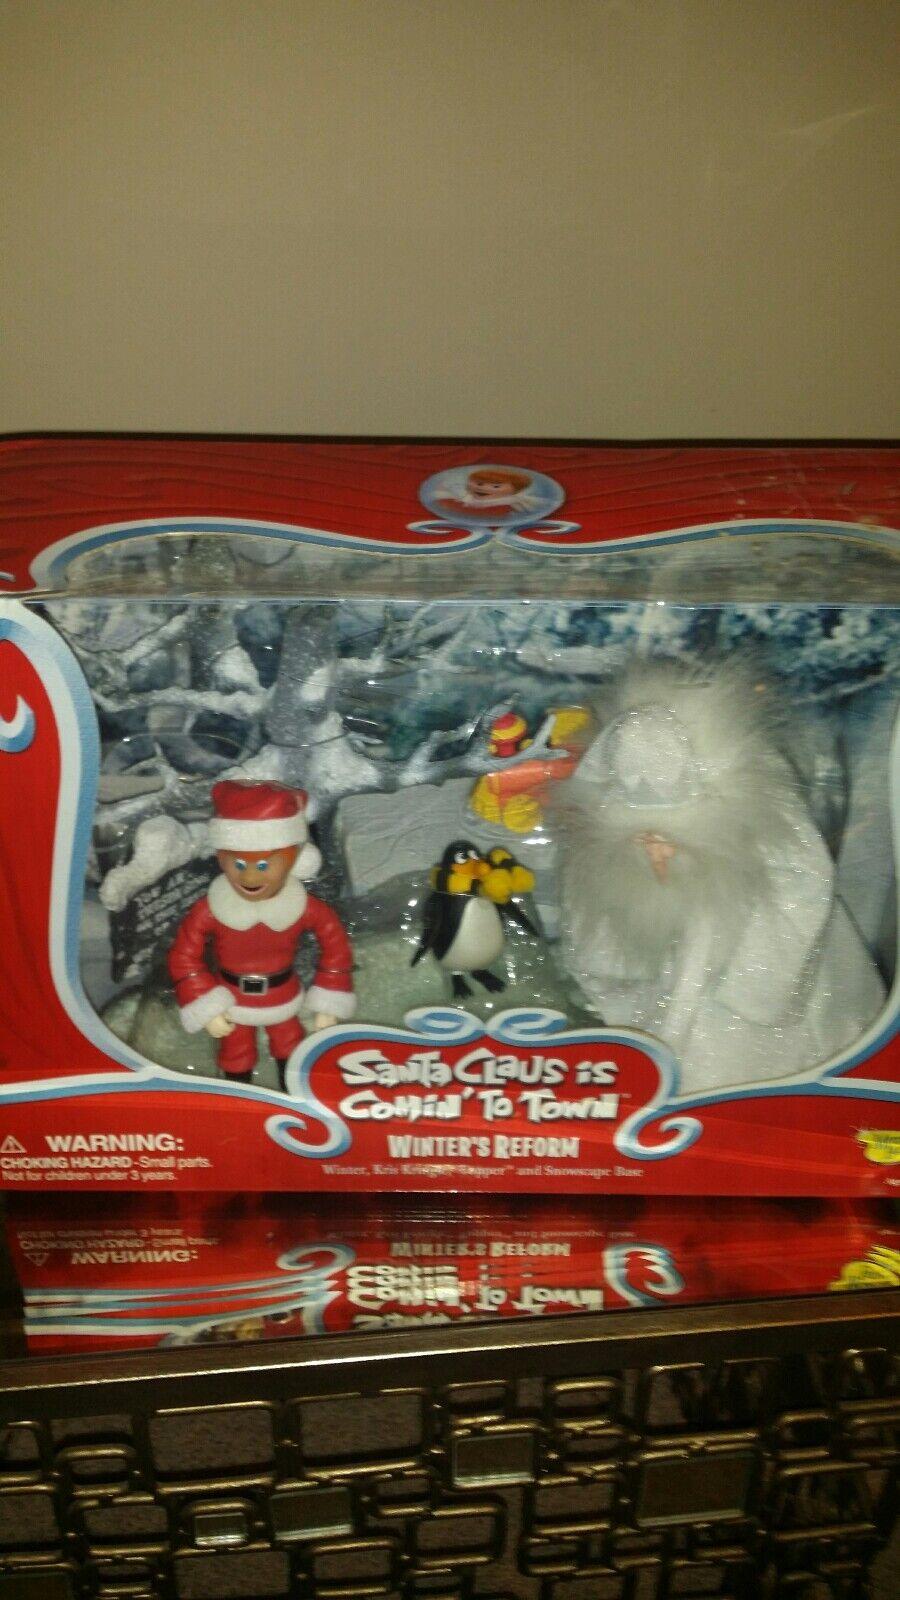 Memory Lane Santa Claus Is Comin Coming To Town Winter's Reform NIB